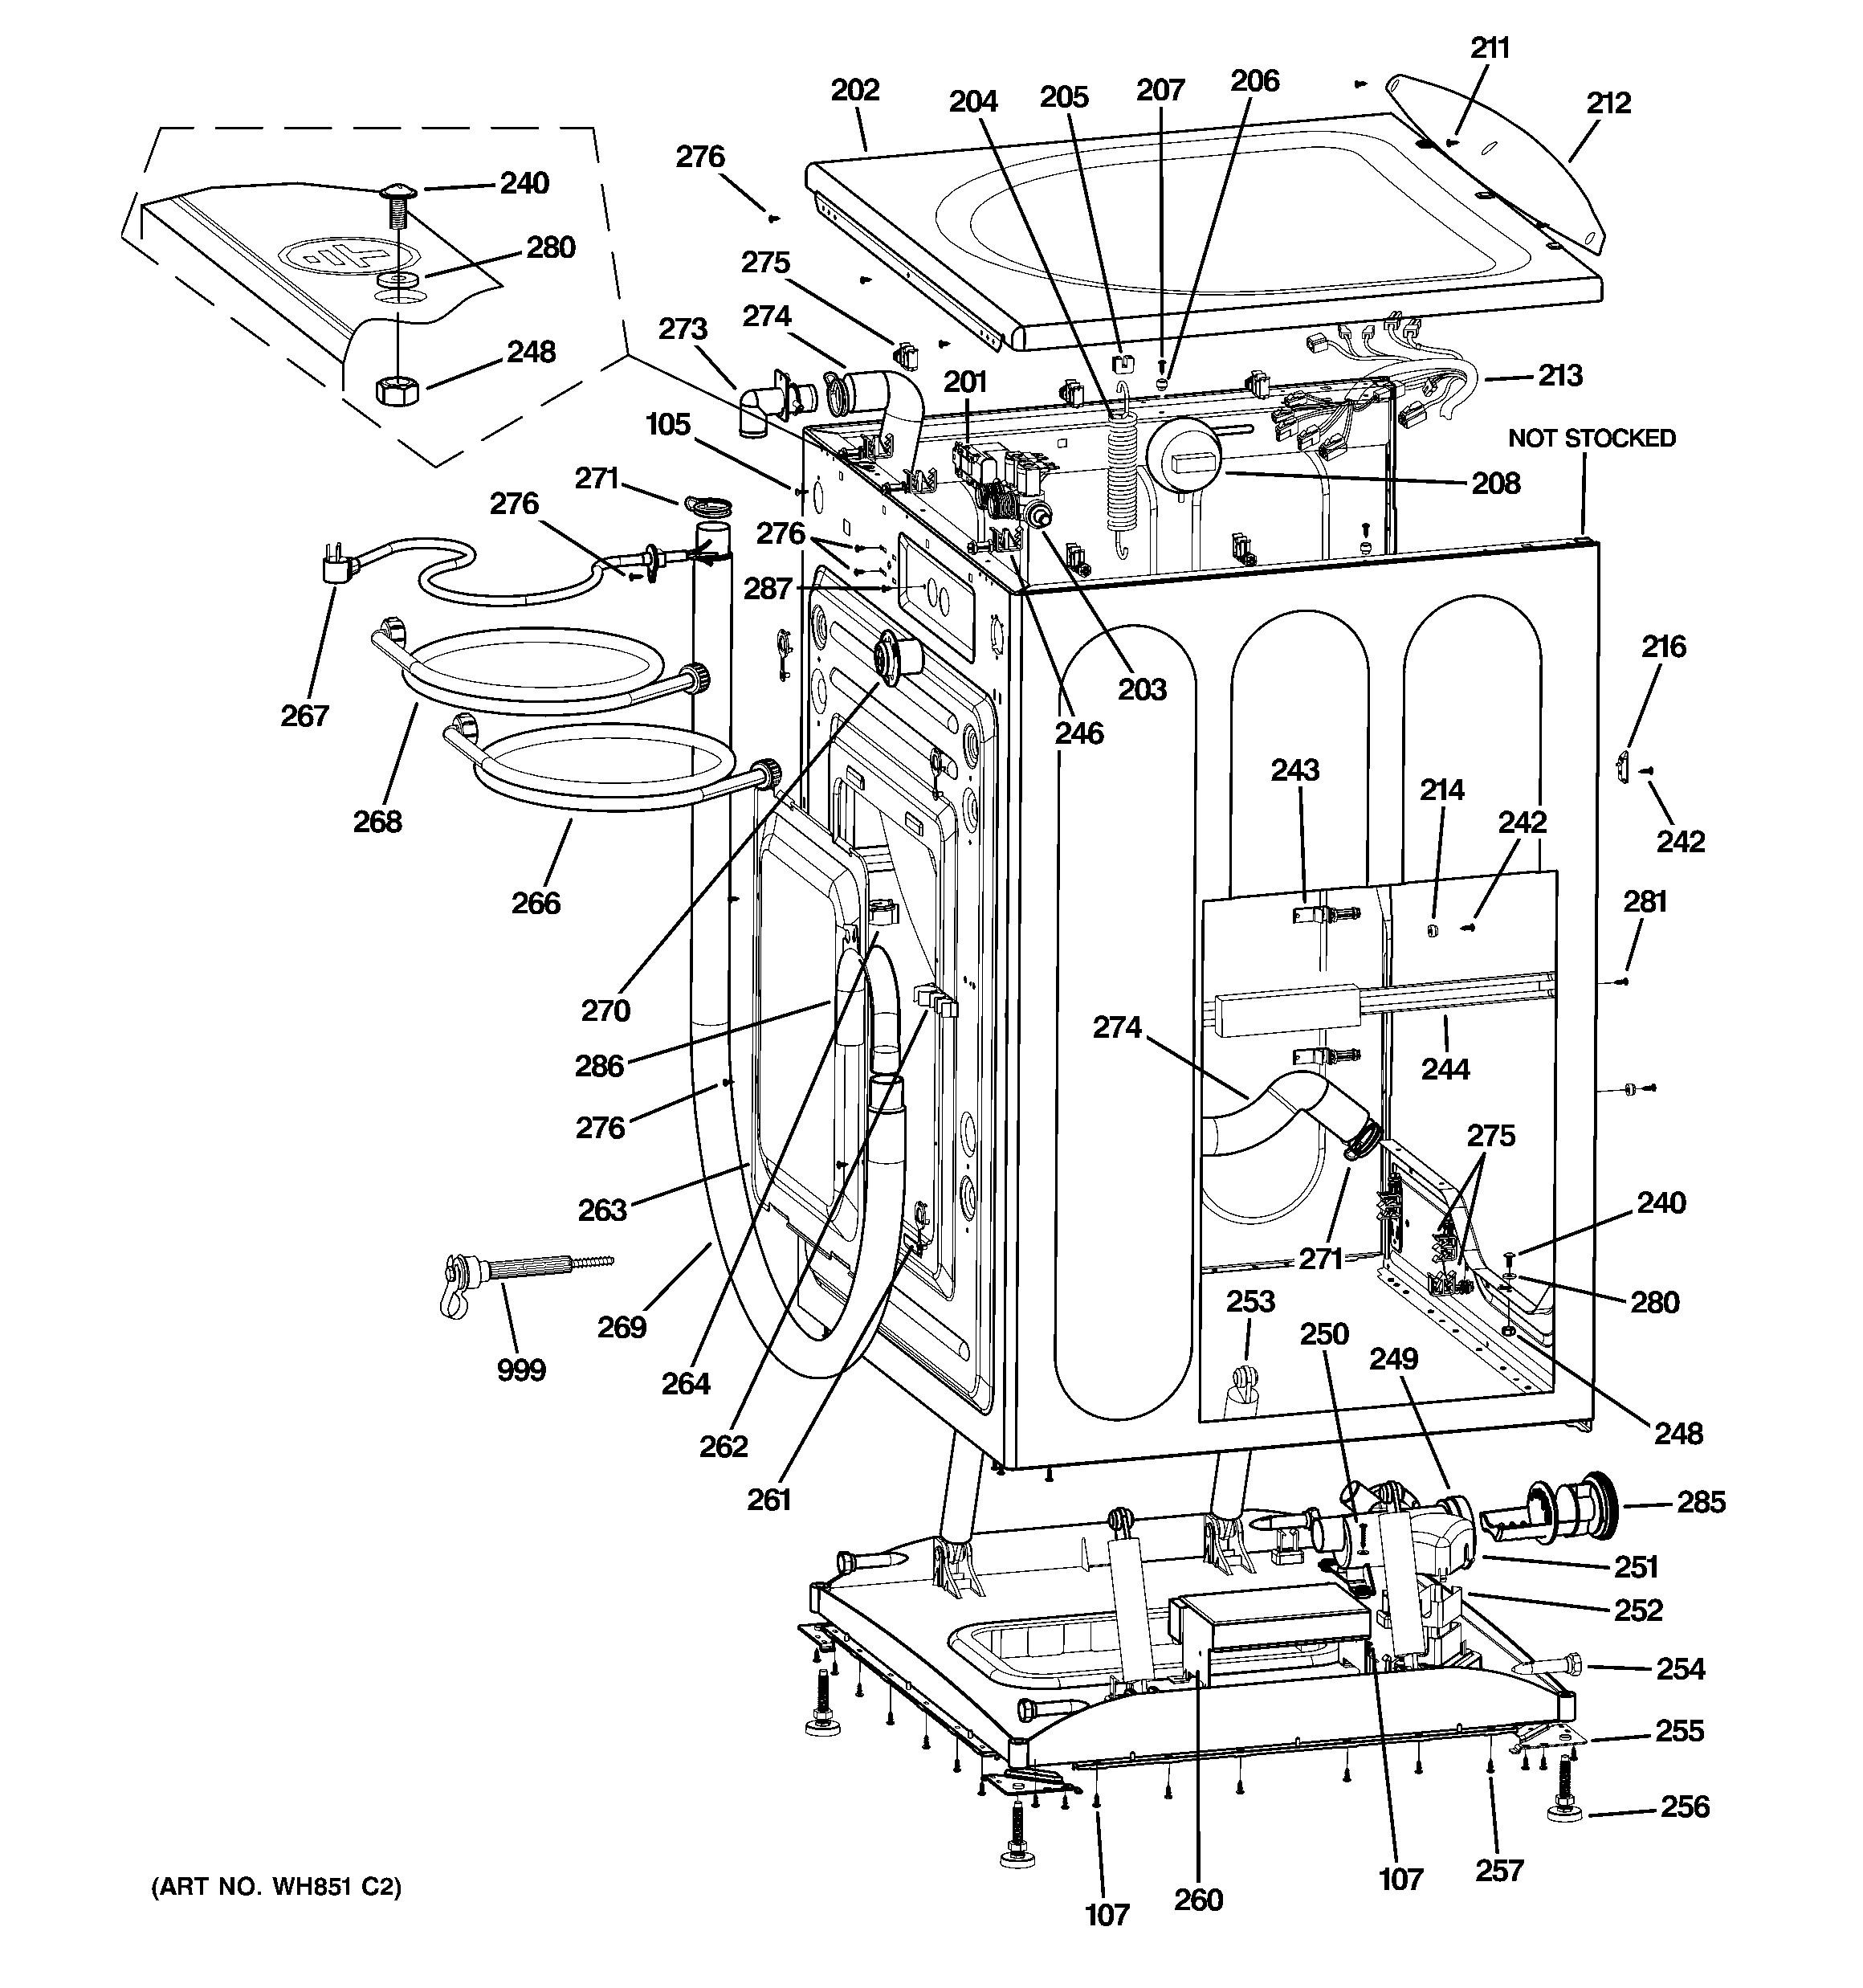 Ge Washing Machine Parts Diagram Ge Model Wcvh6800j0ww Residential Washers Genuine Parts Of Ge Washing Machine Parts Diagram